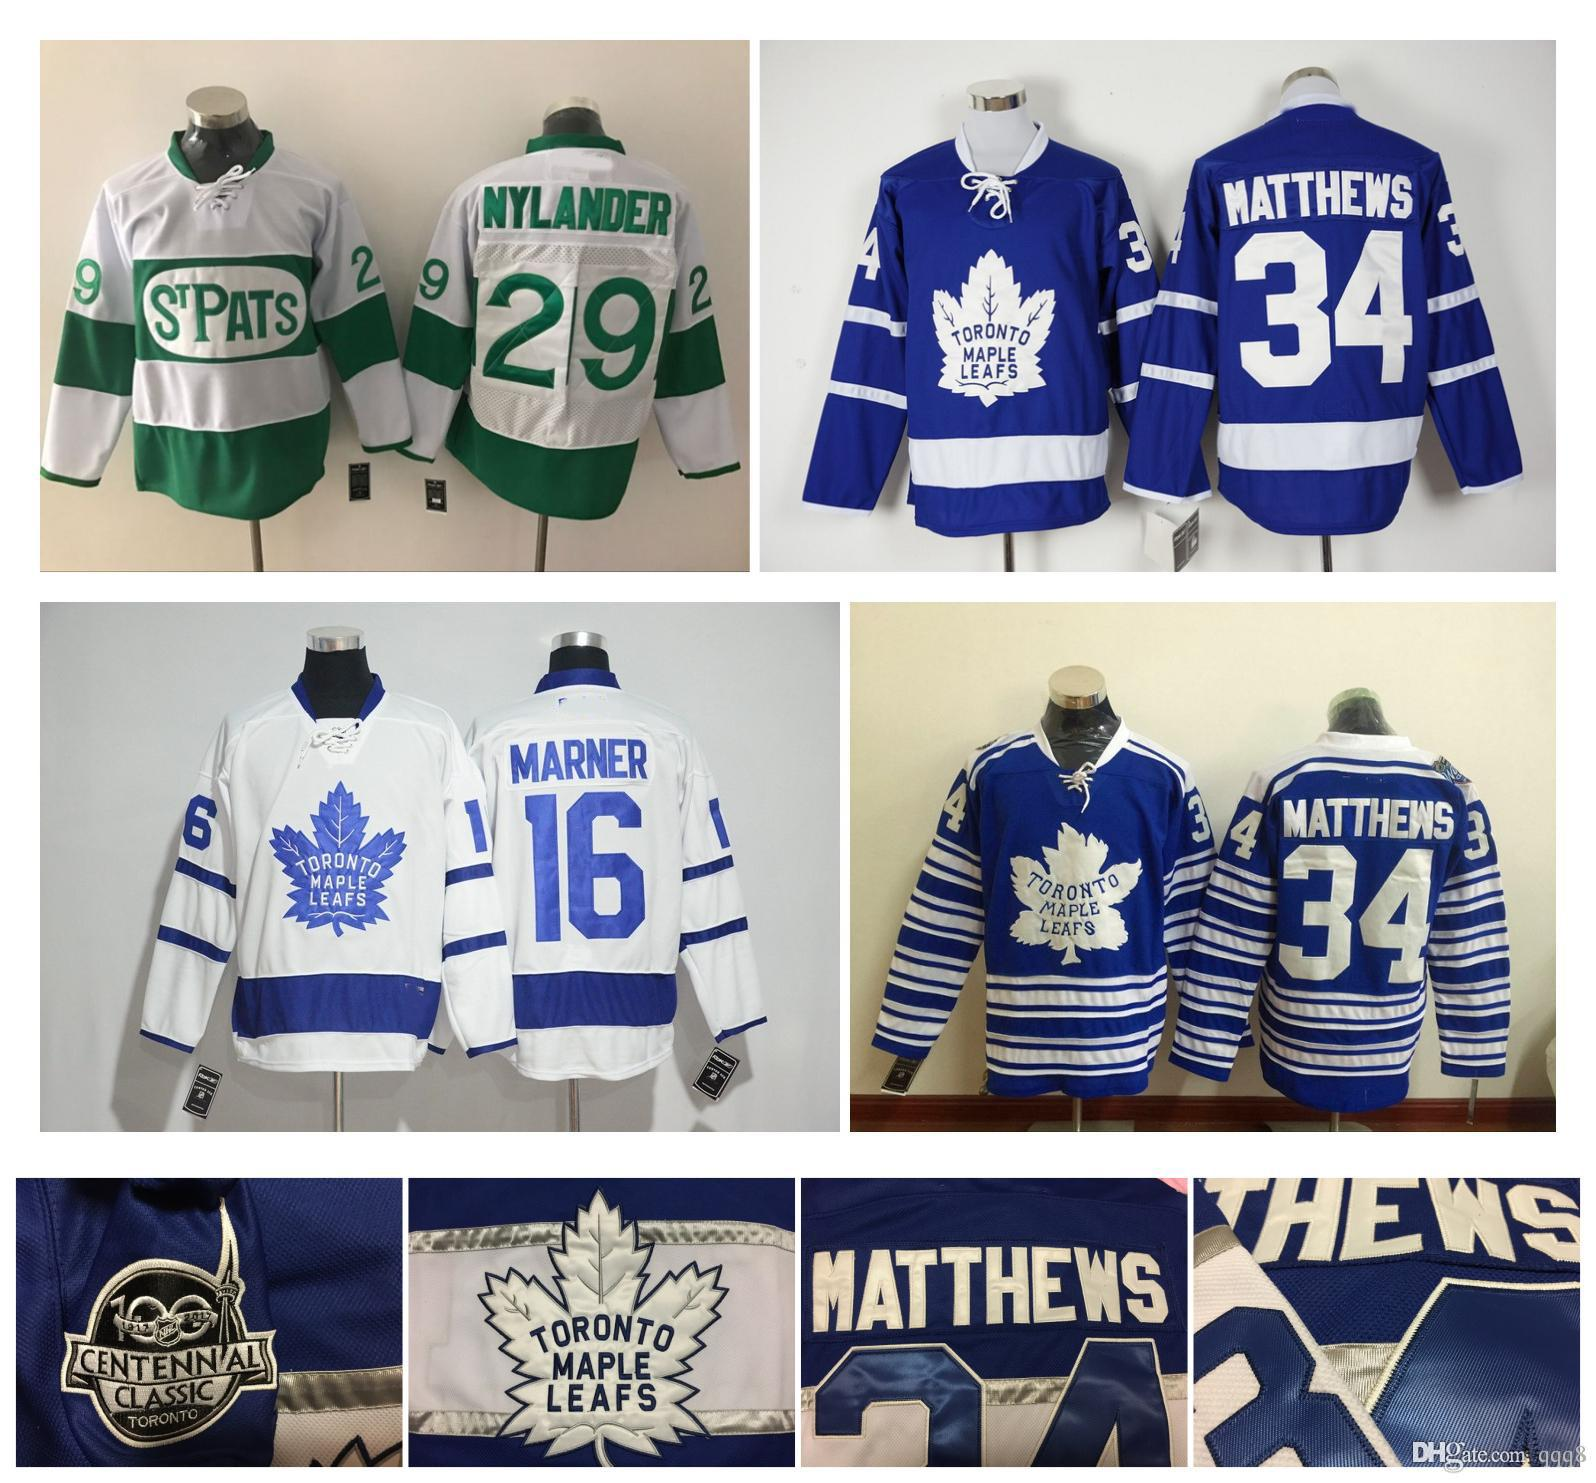 8812752b950 34 Auston Matthews Toronto Maple Leafs Jersey 16 Mitch Marner 29 William  Nylander 44 Morgan Rielly Centennial Classic NHL Hockey Jersey Nhl Hockey  Jerseys ...